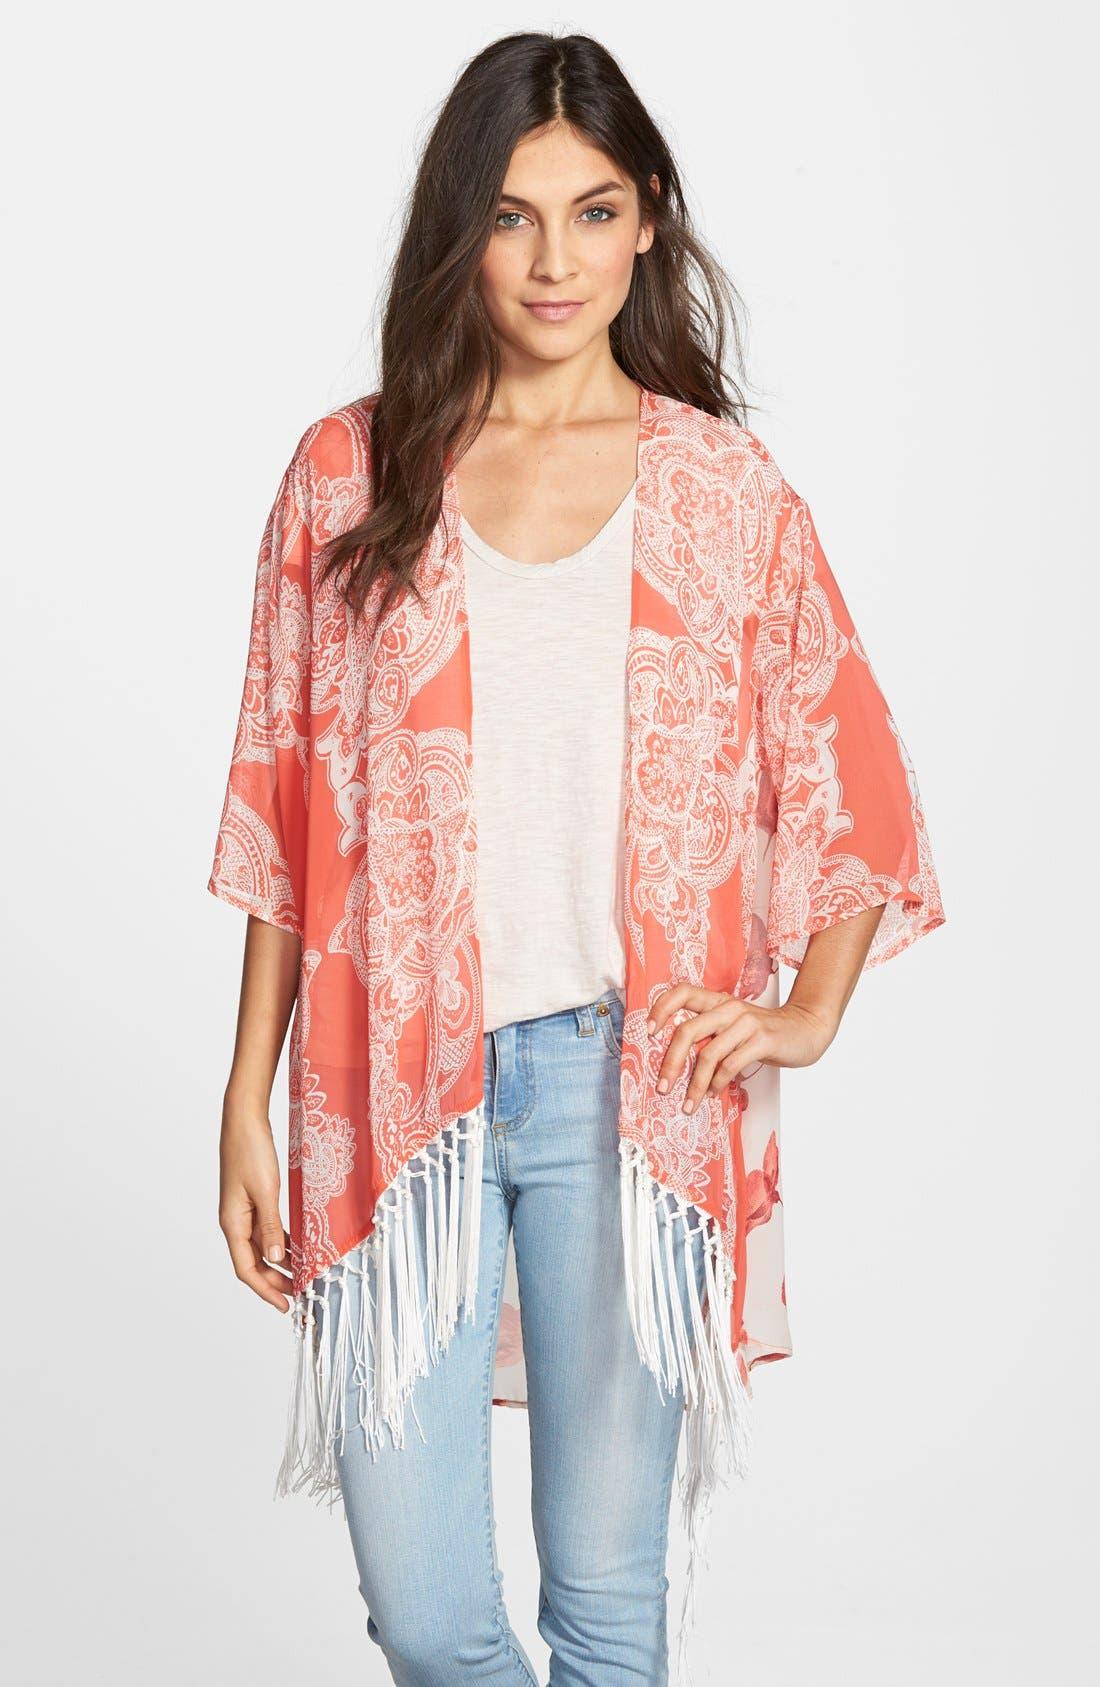 Main Image - West Kei Print Kimono Jacket